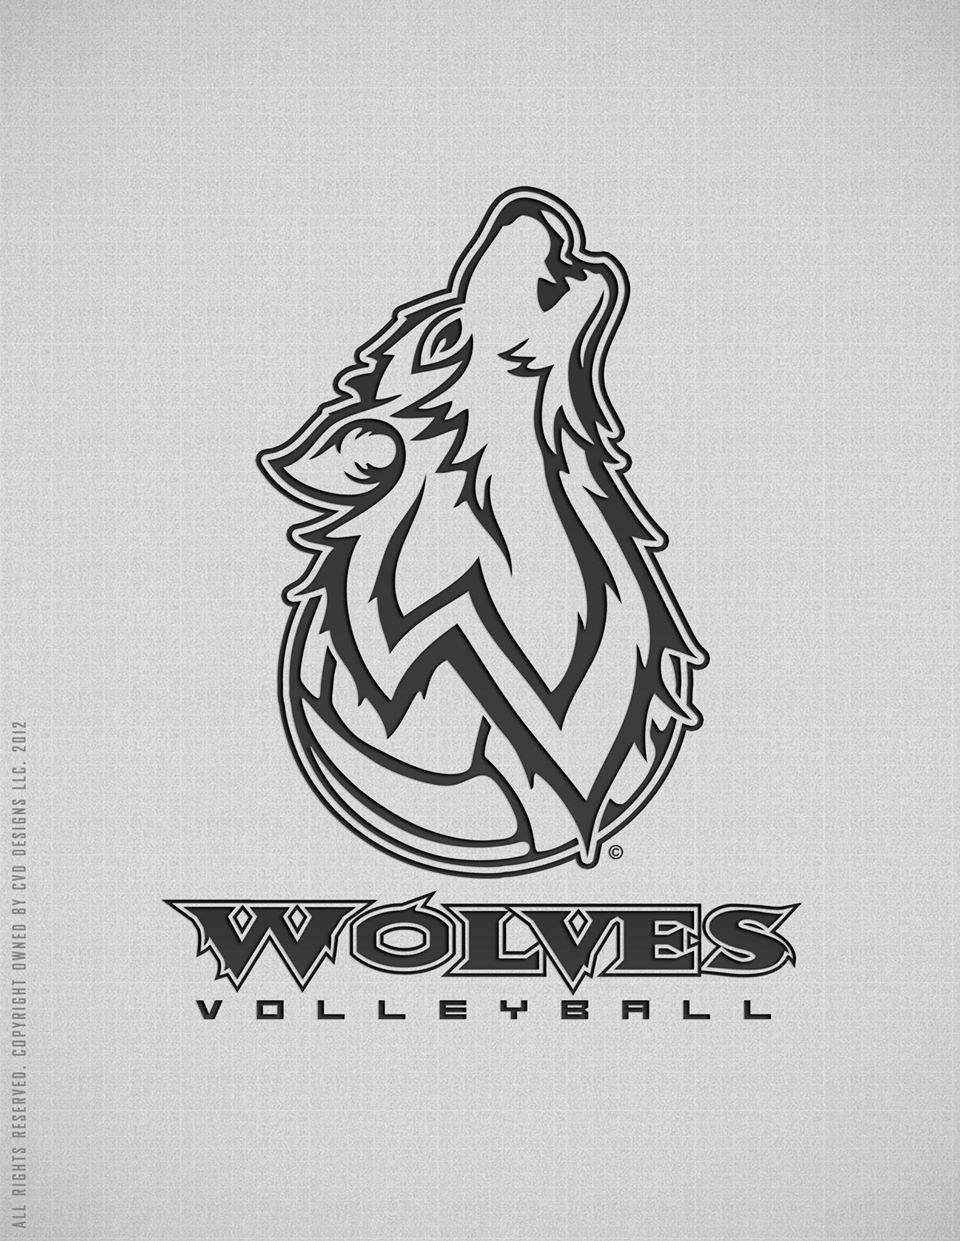 afbc7cf09 Wyoming Wolves volleyball logo design | My Logo Designs | Sports ...